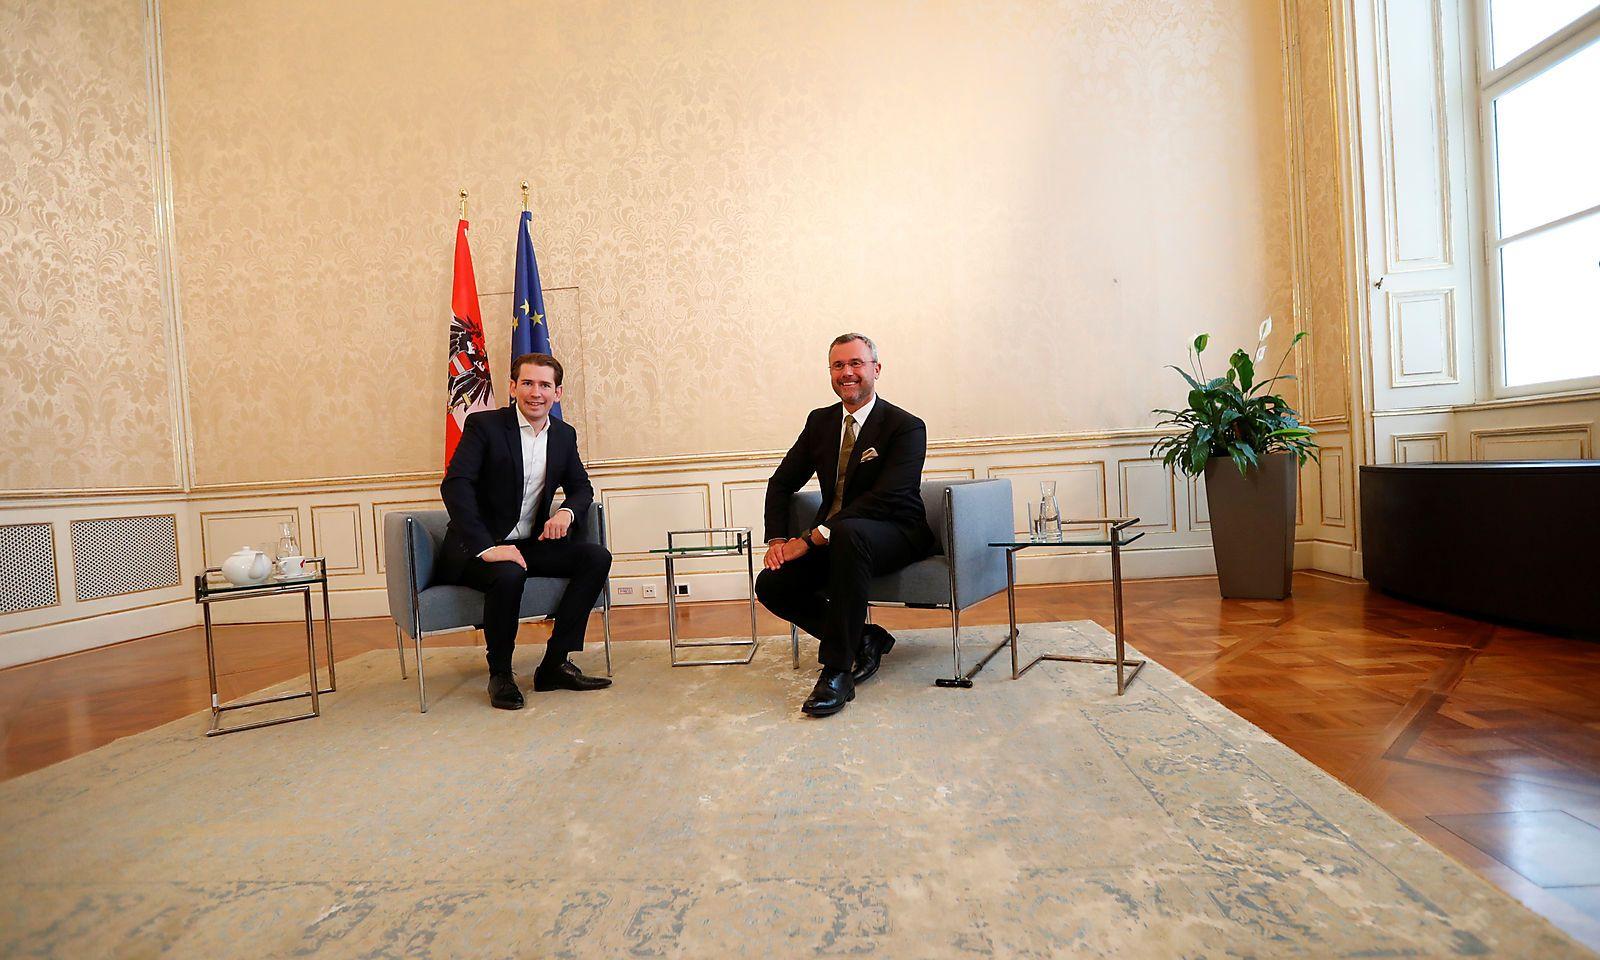 Head of OeVP Kurz meets head of FPOe Hofer in Vienna